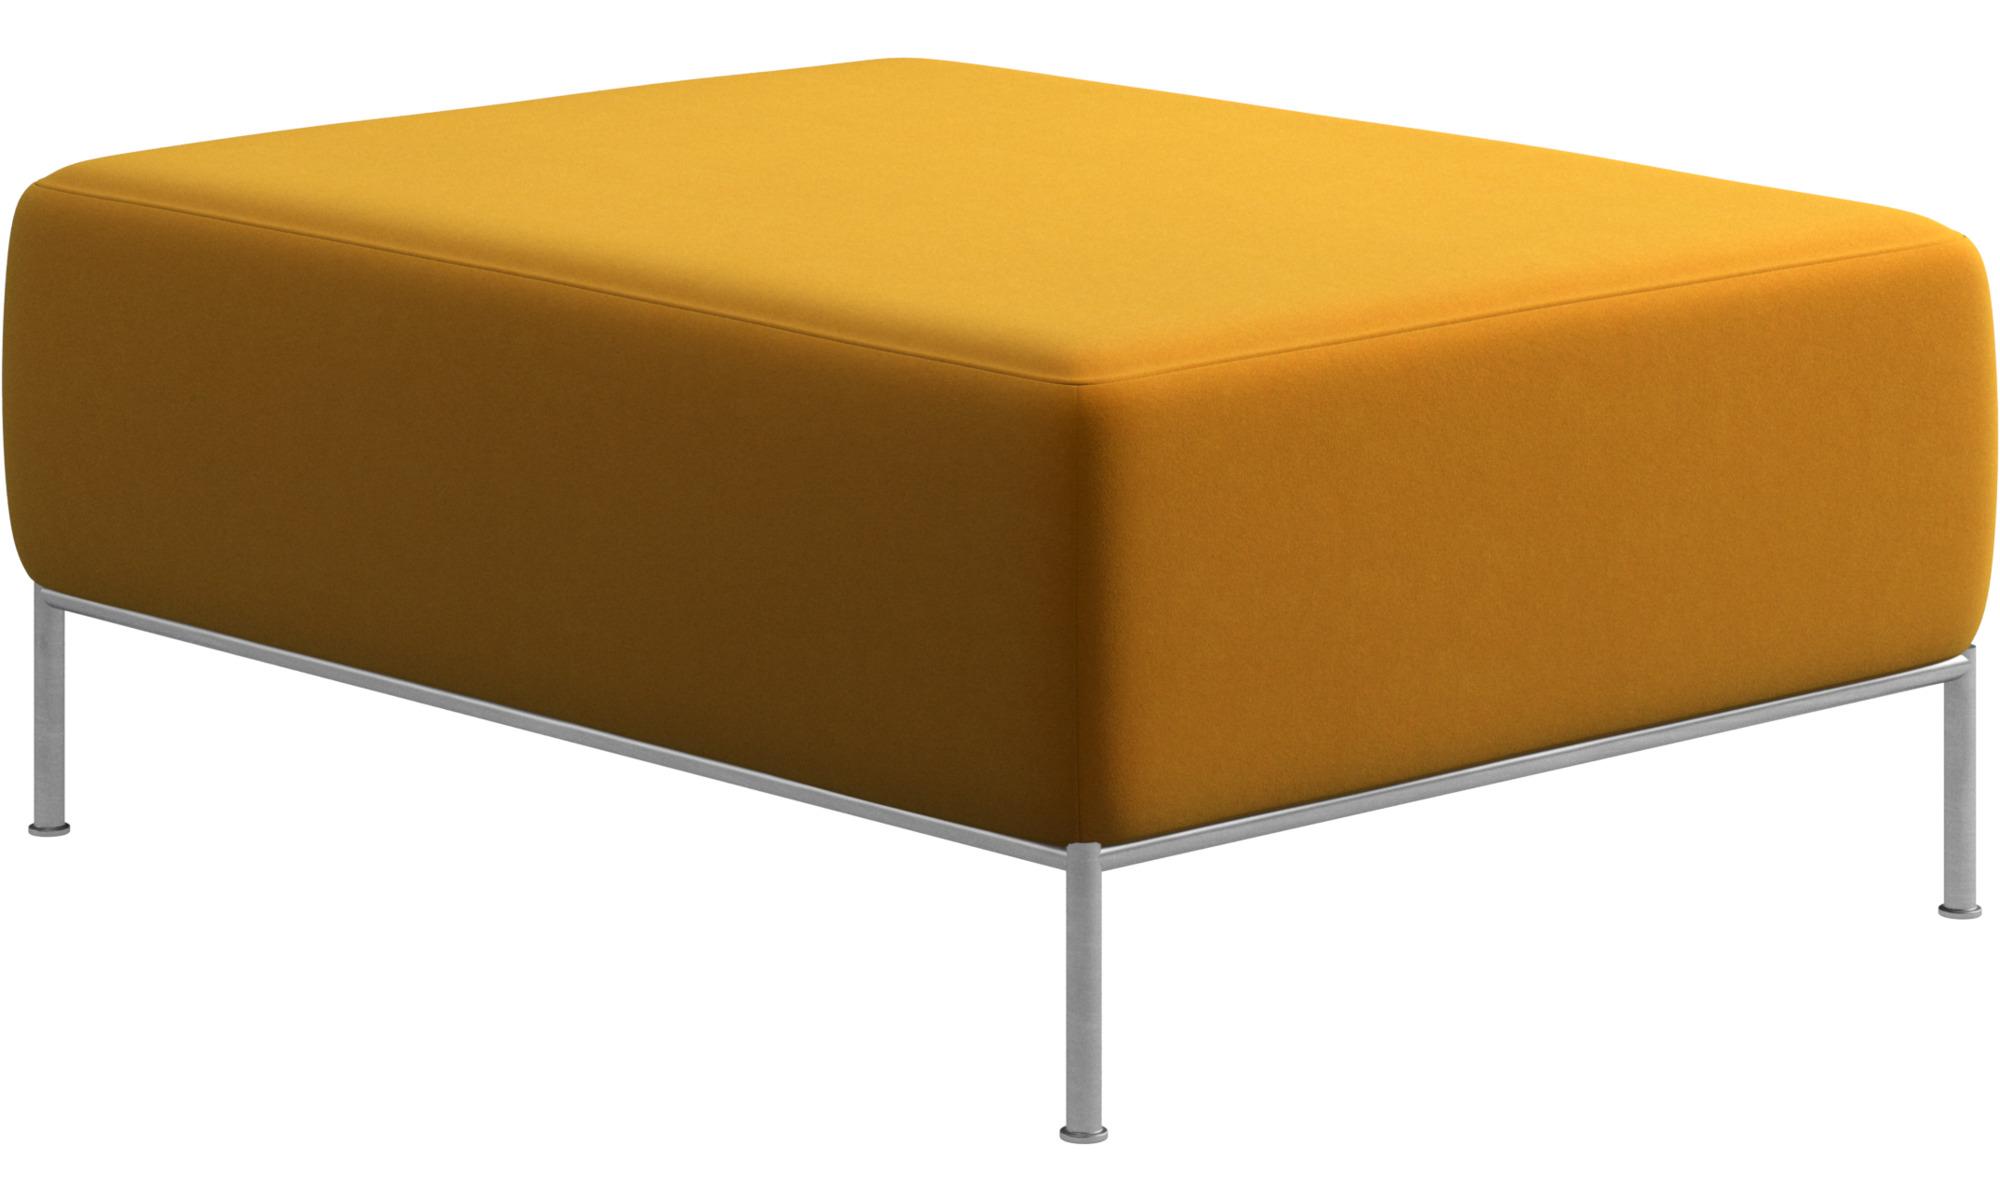 canap s modulaires pouf miami boconcept. Black Bedroom Furniture Sets. Home Design Ideas